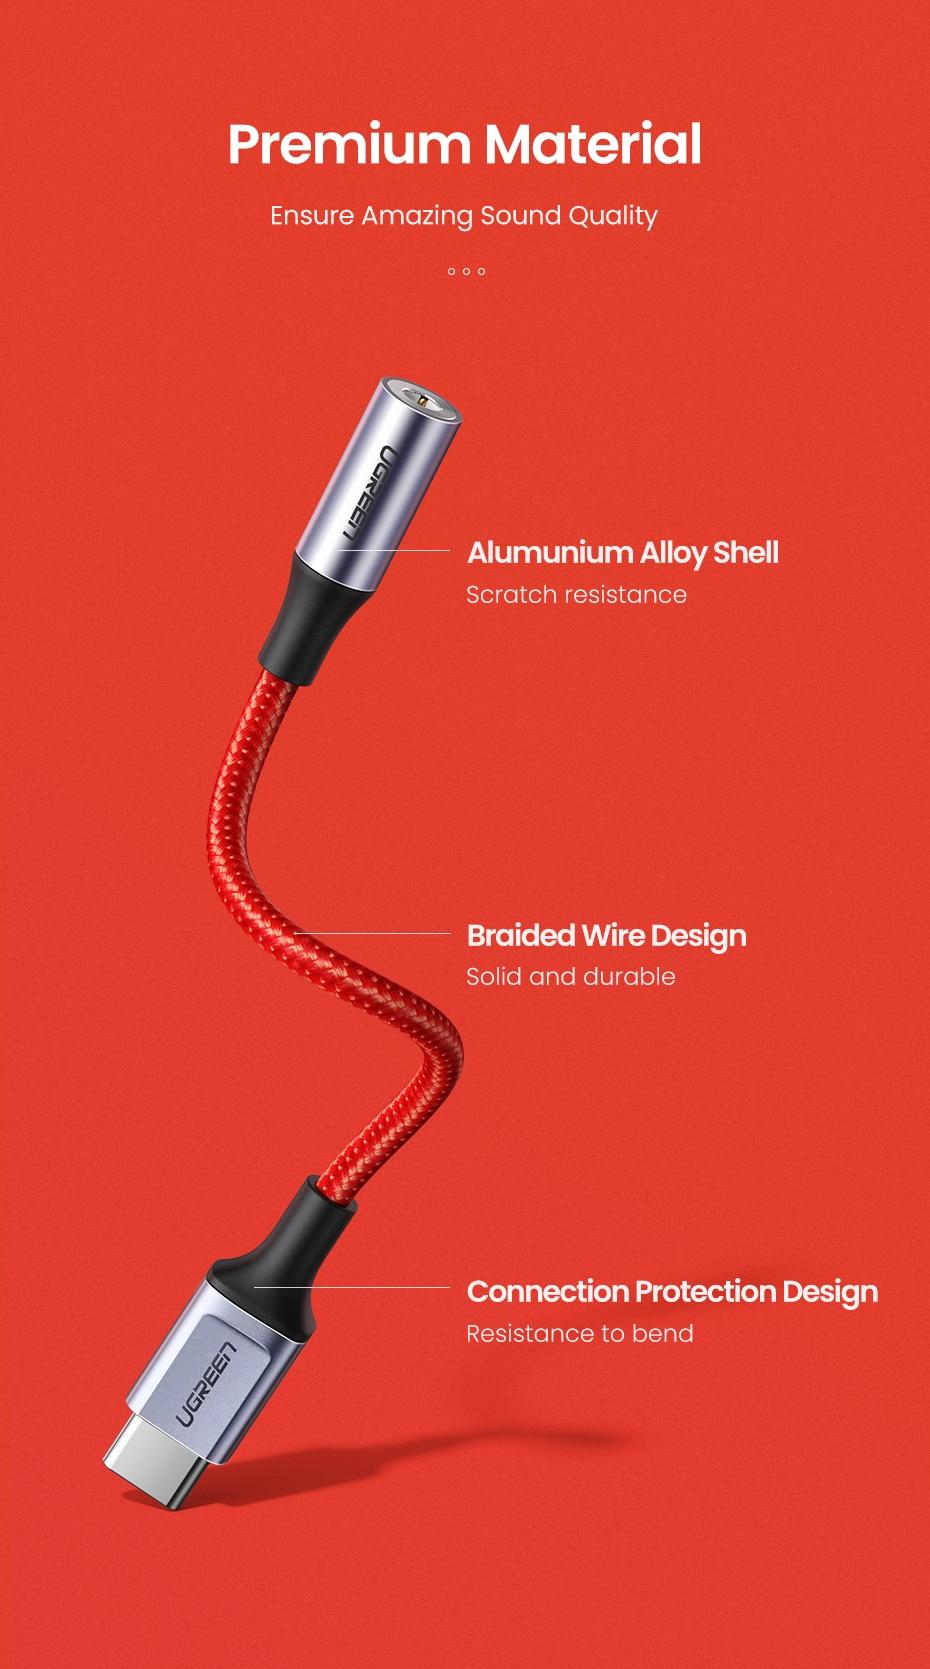 Ugreen Type C to 3.5mm Adapter Pakistan BrandTech.pk